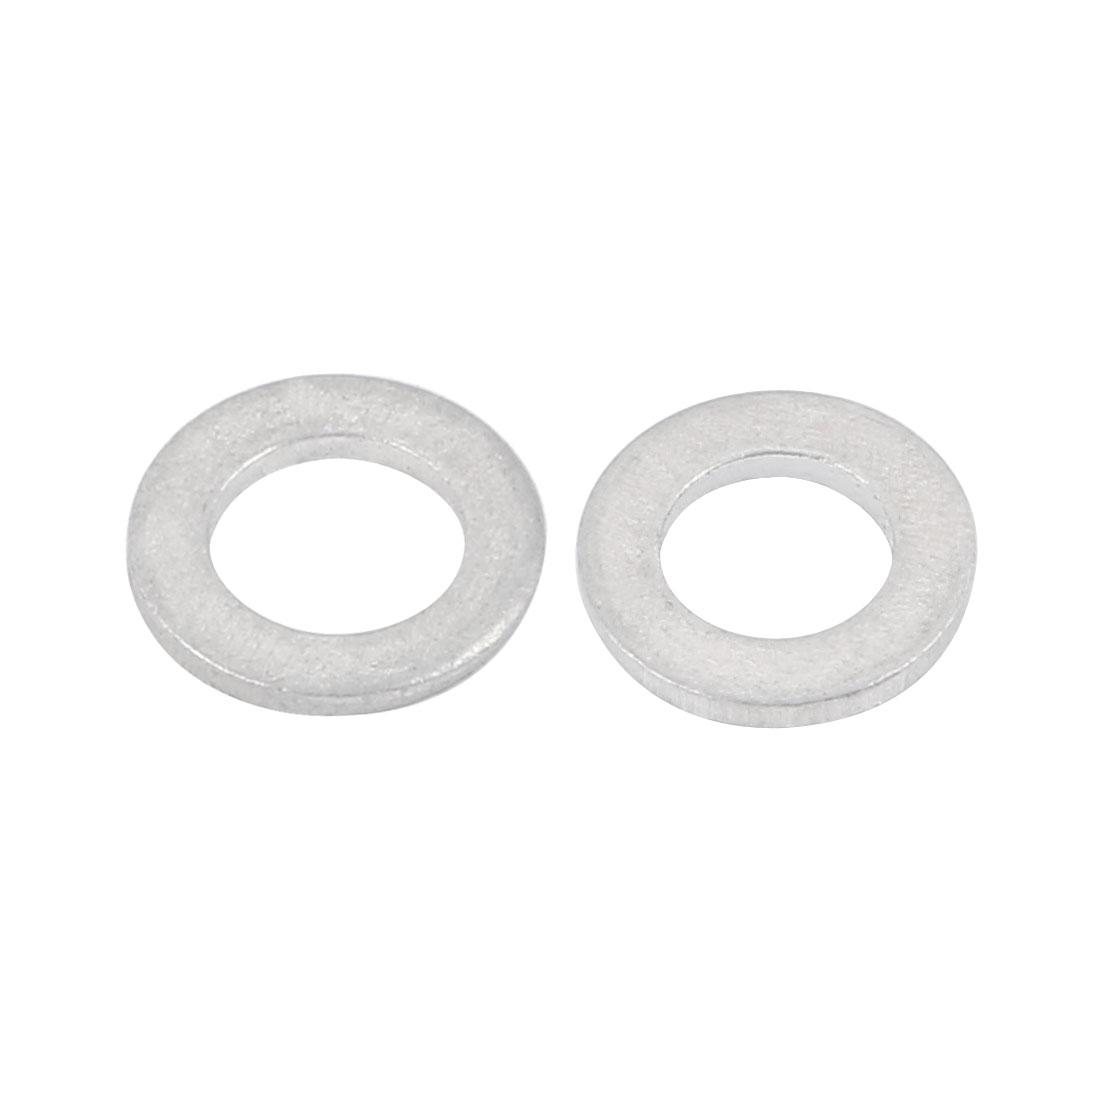 6mmx10mmx1mm Motorcycle Hardware Drain Plug Crush Aluminum Washer Seals 50pcs - image 1 de 2